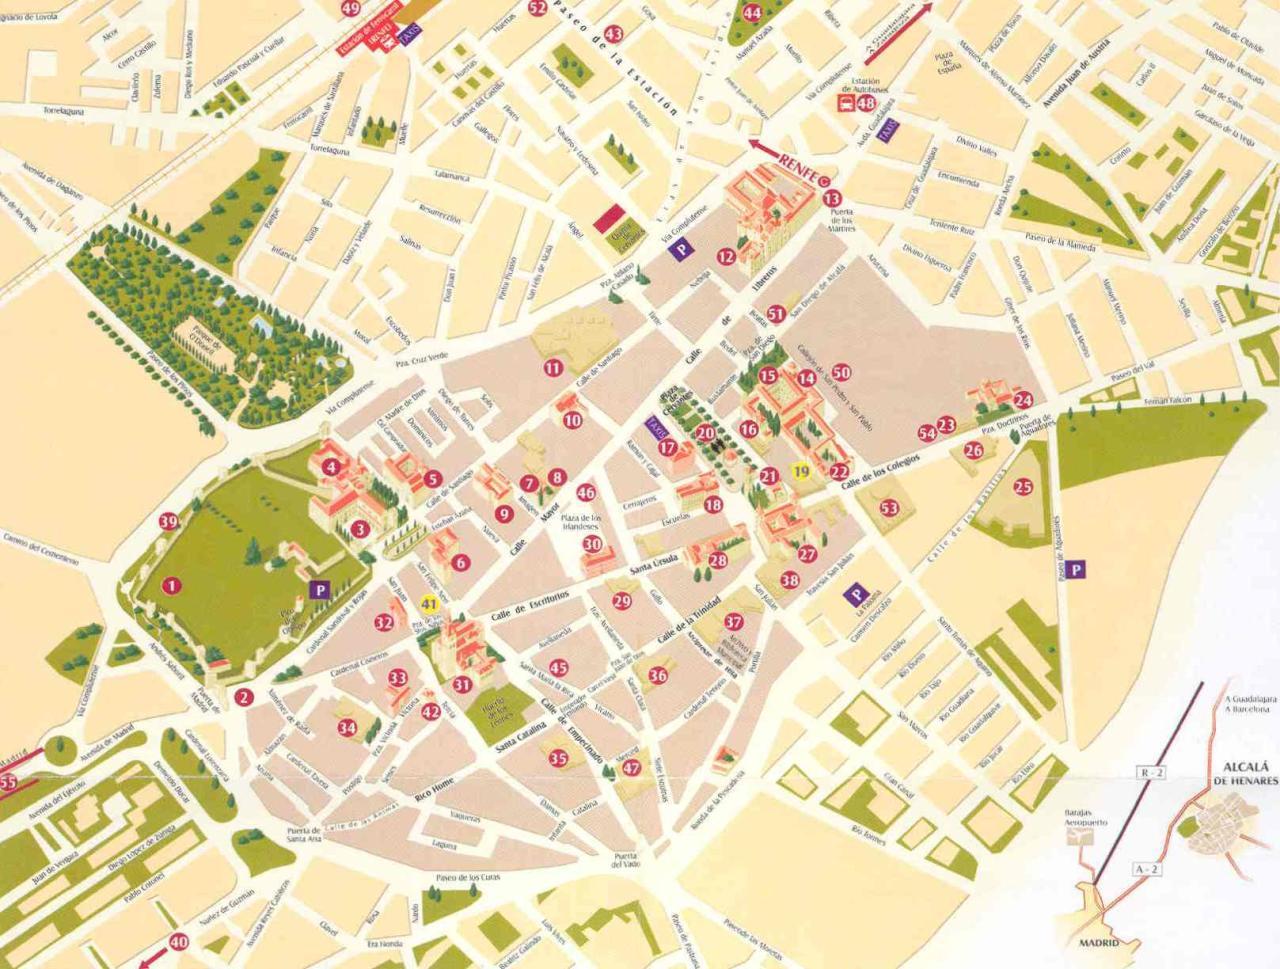 mapa alcala de henares